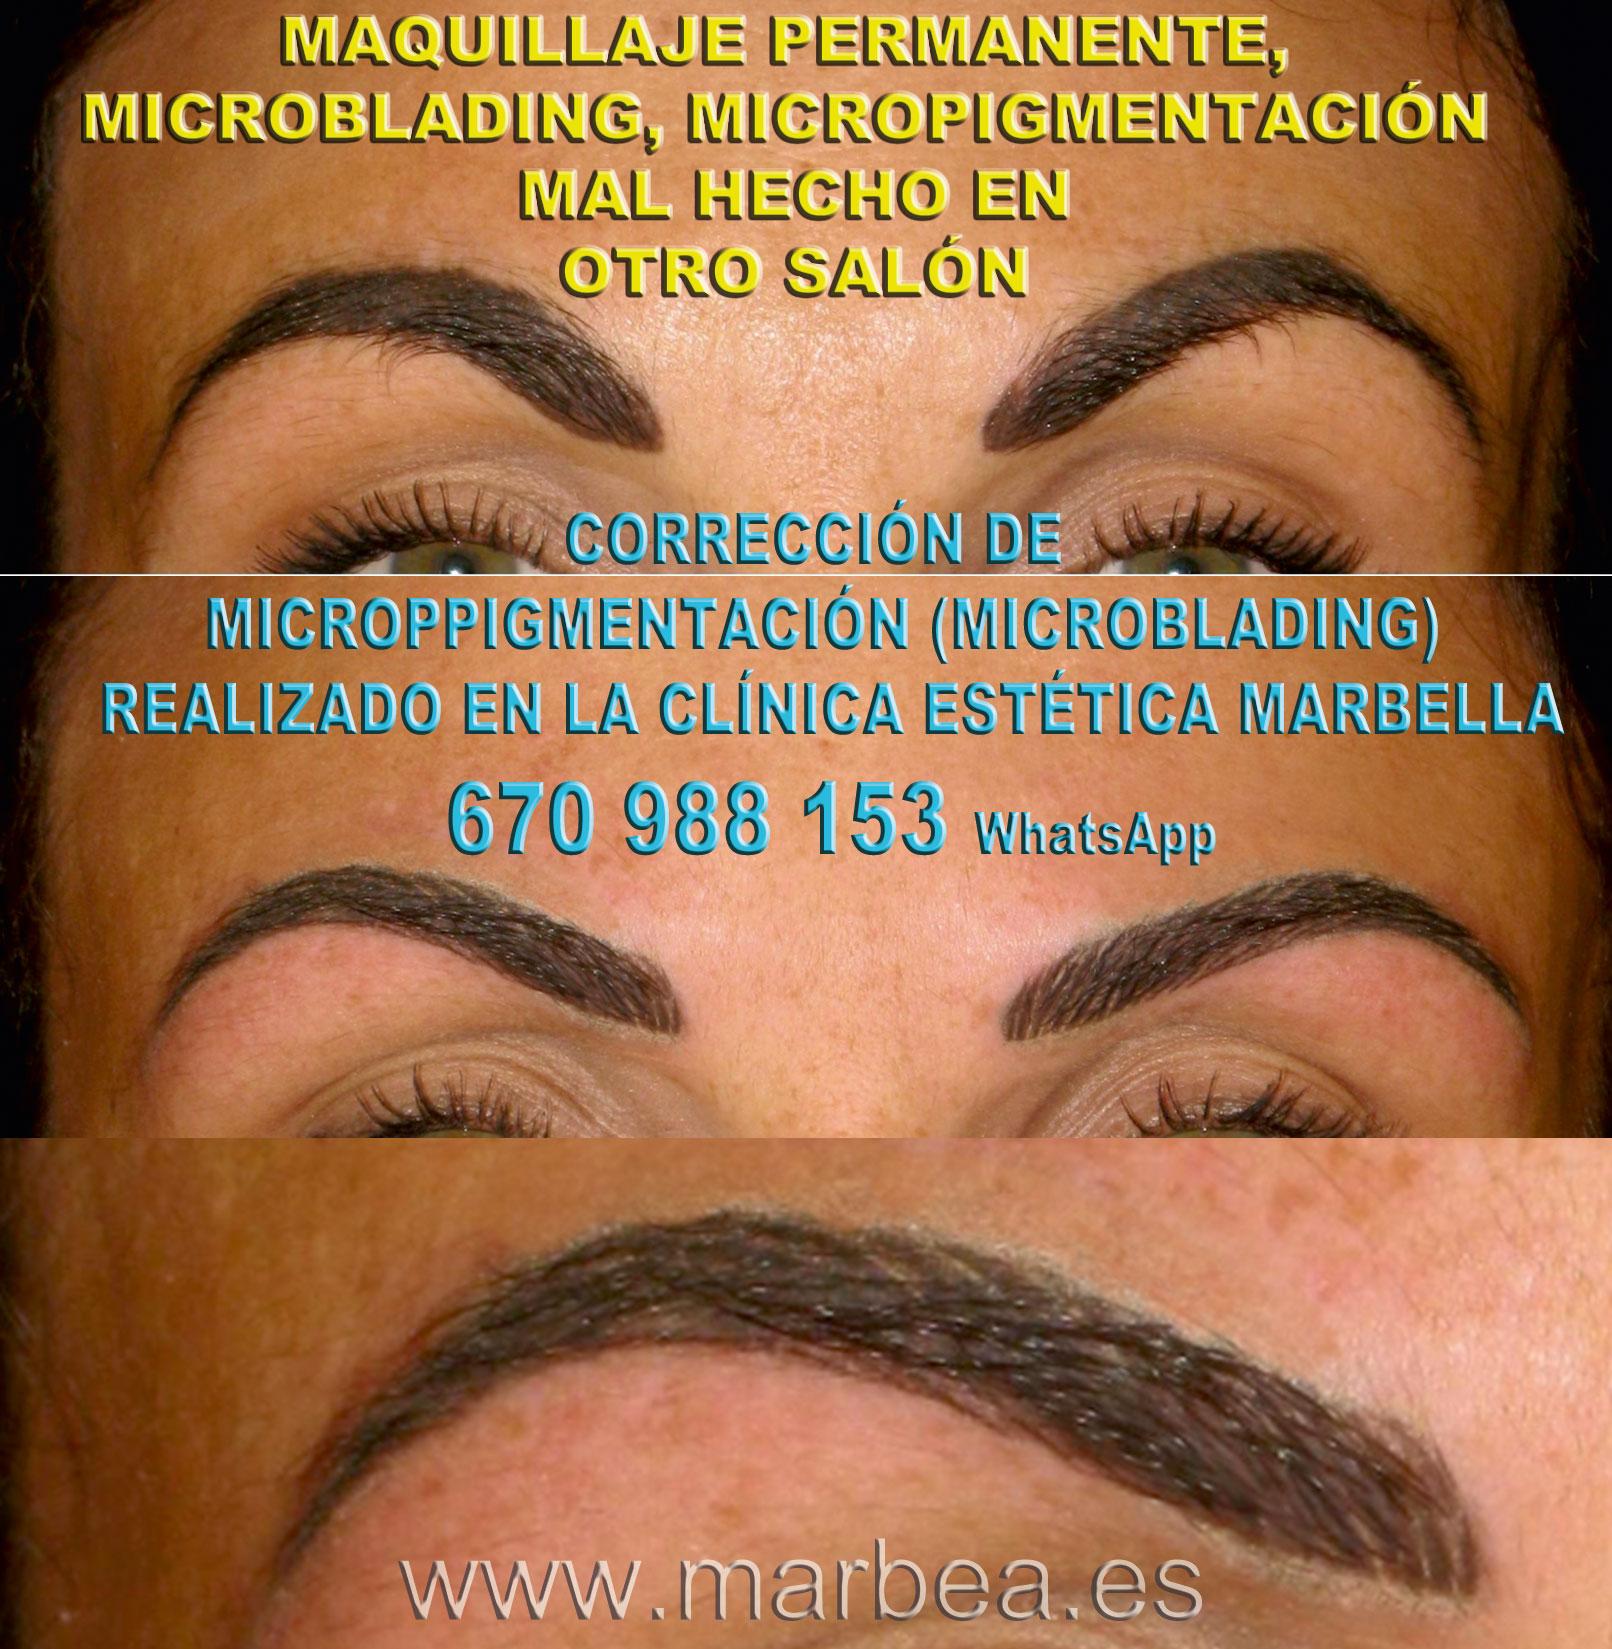 ELIMINAR TATUAJE CEJAS clínica estética tatuaje propone corrección de cejas mal tatuadas,micropigmentación correctiva cejas mal hecha